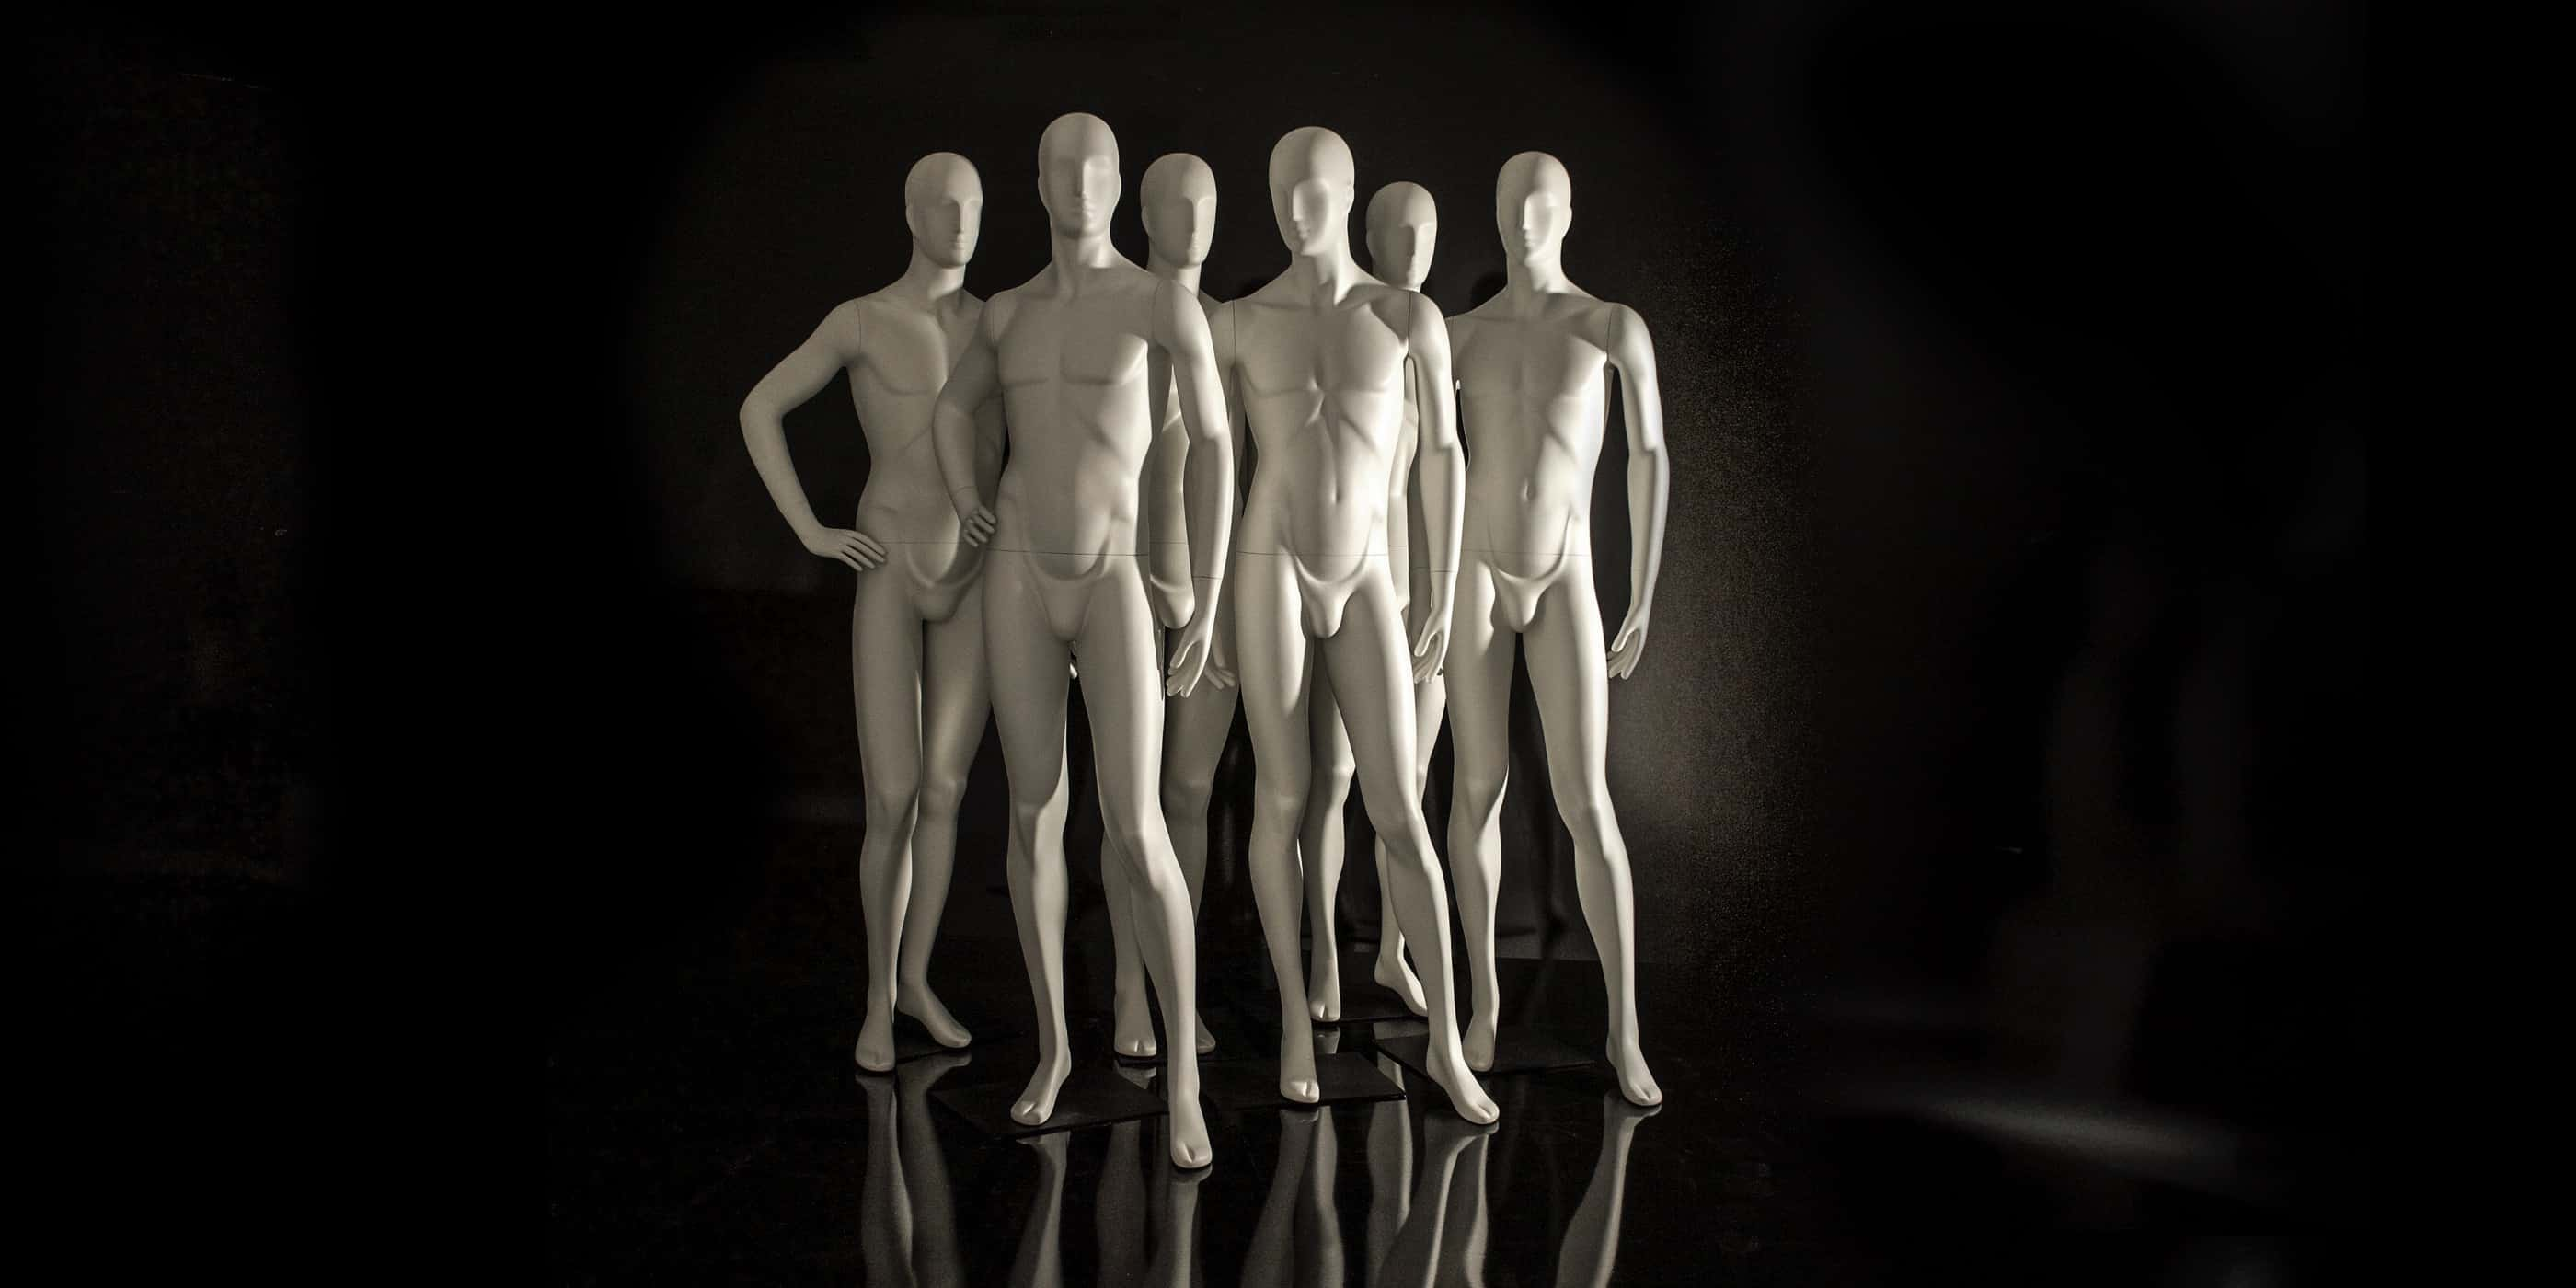 2800 3800 mannequins 05